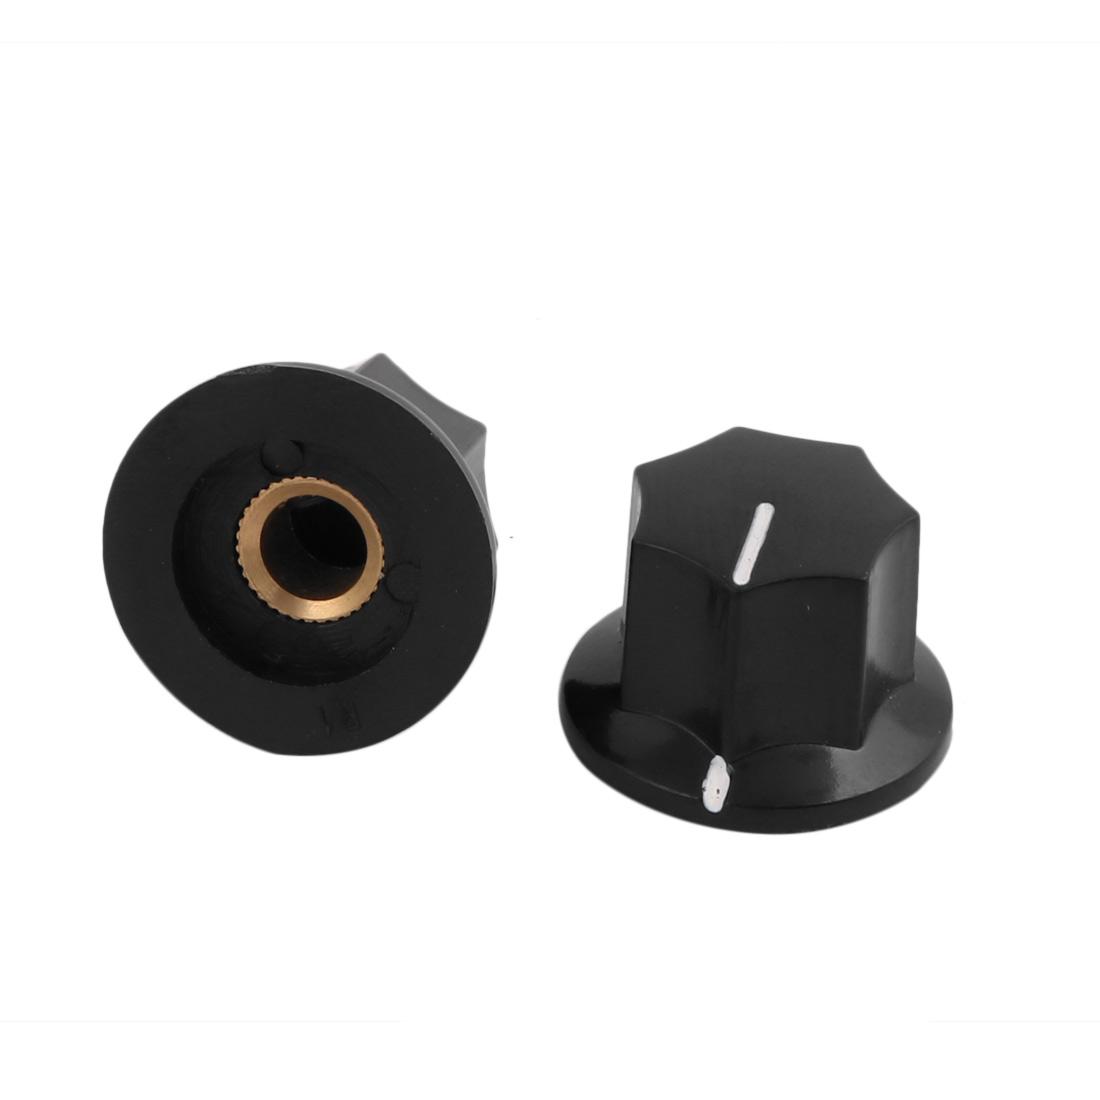 2 pcs Nonslip Rotary Potentiometer Control Knobs 6mm Shaft Dia Black